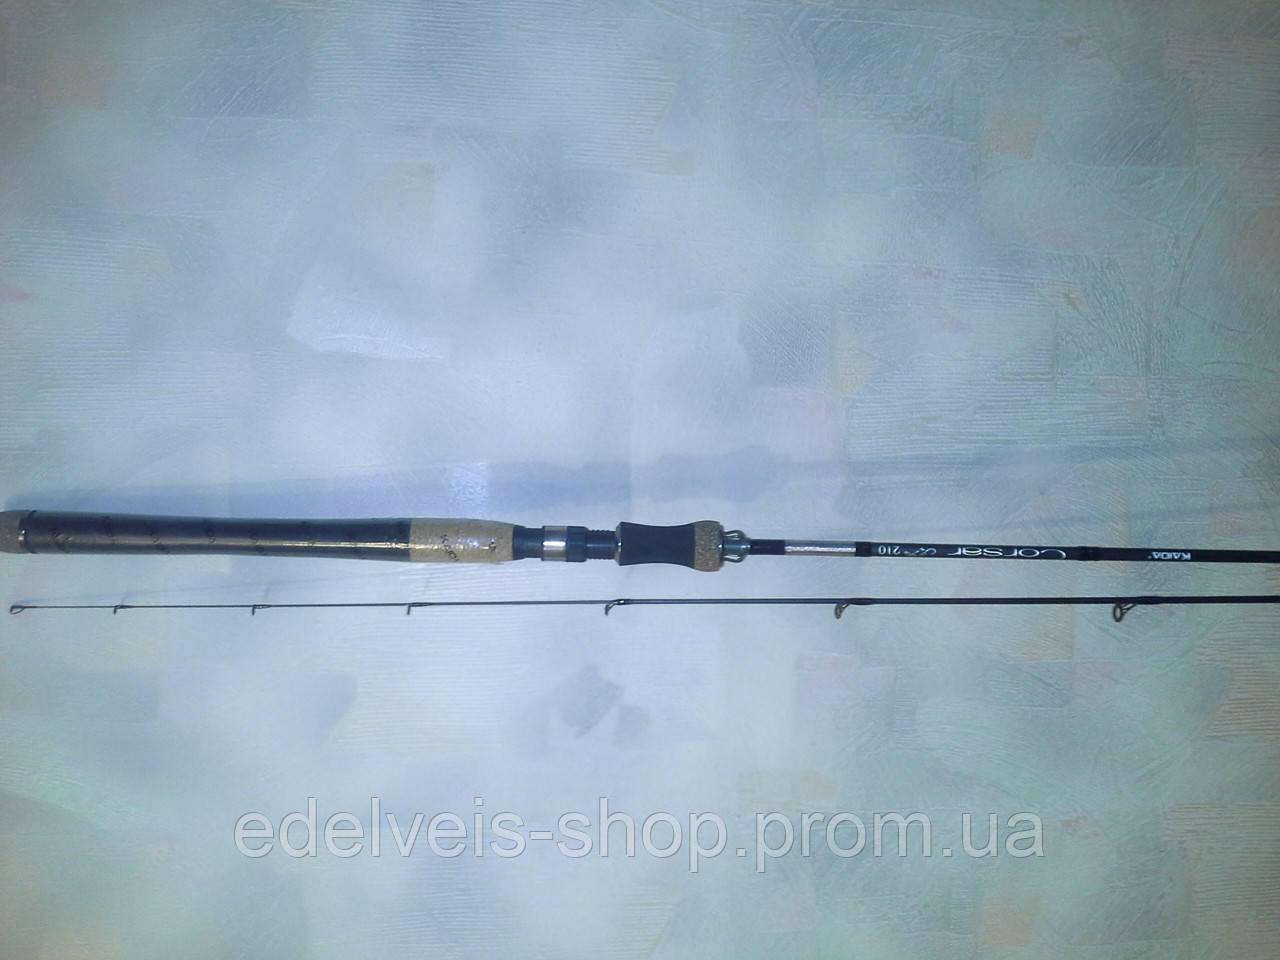 Спиннинг  ультралайт KAIDA(weida) CORSAR 2-8 гр  2.1м Carbon IM8